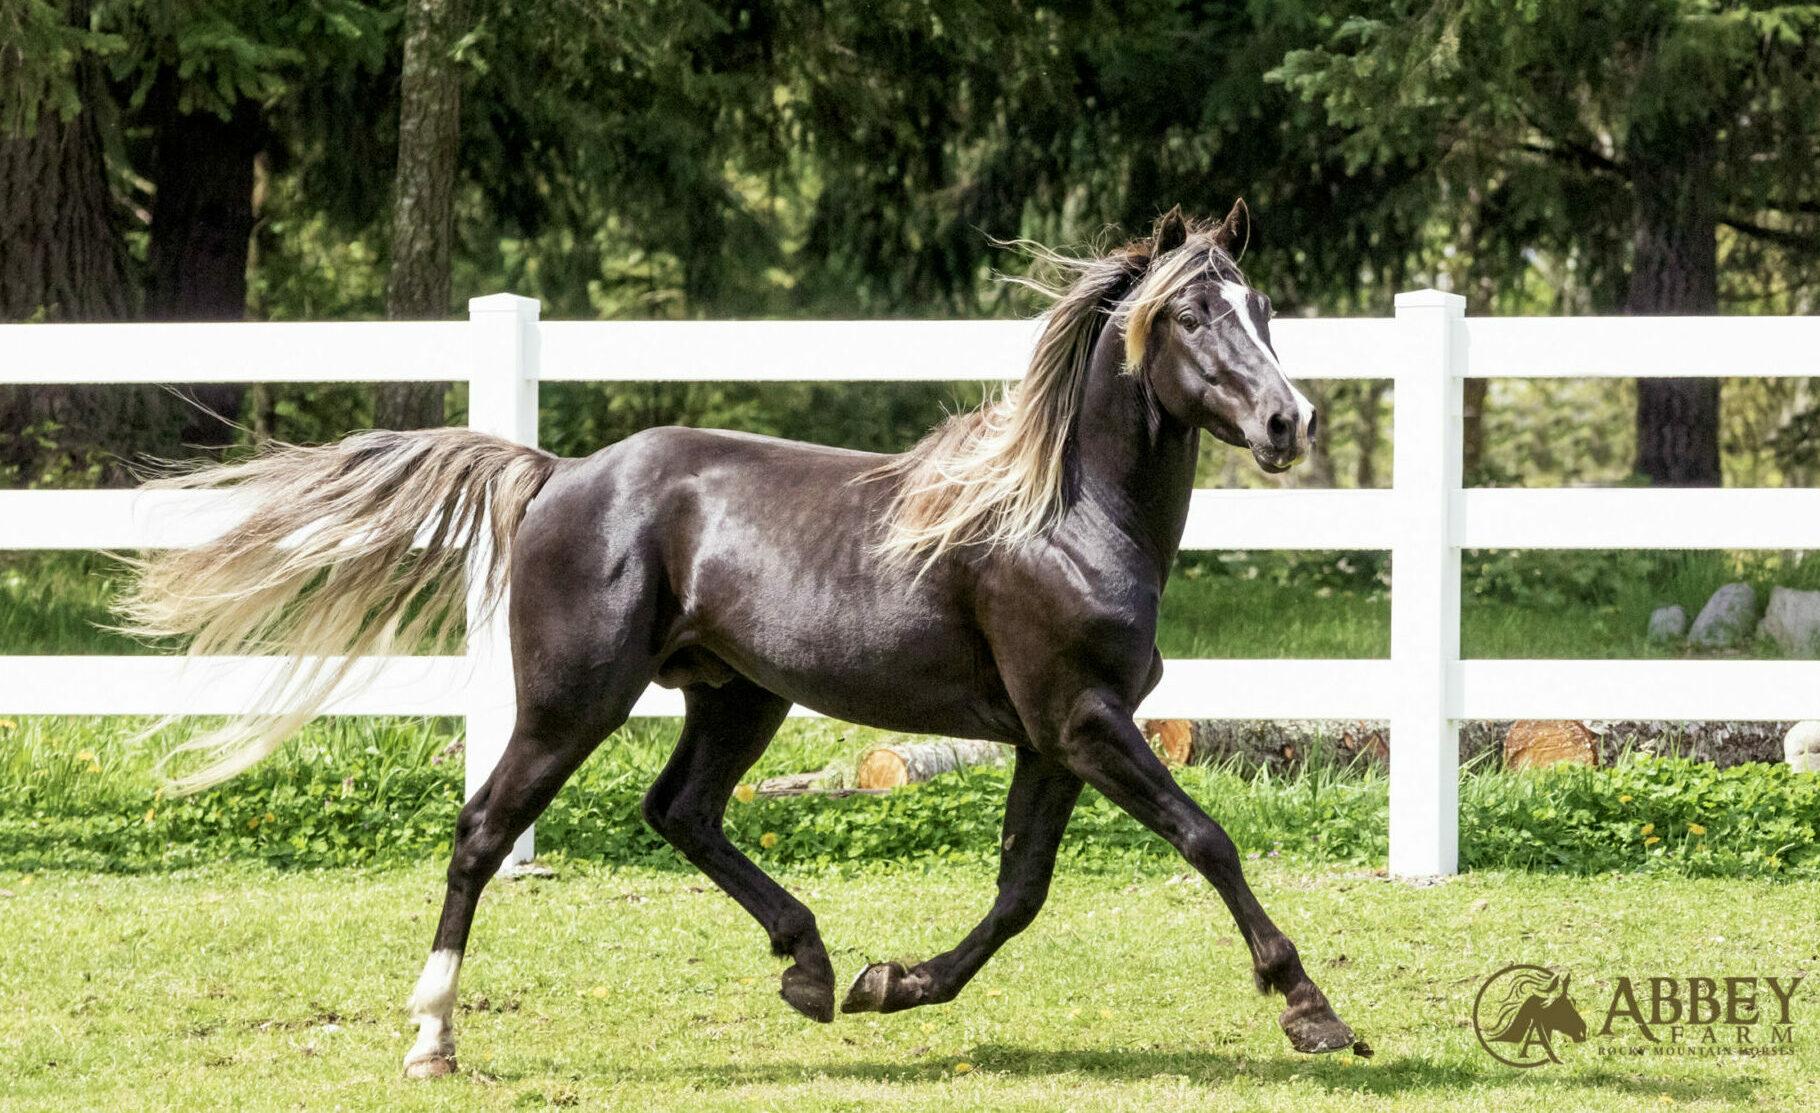 Horse Breed: Rocky Mountain Horse - photo by Abbey Rocky Mountain Horses - Globetrotting horse riding holidays